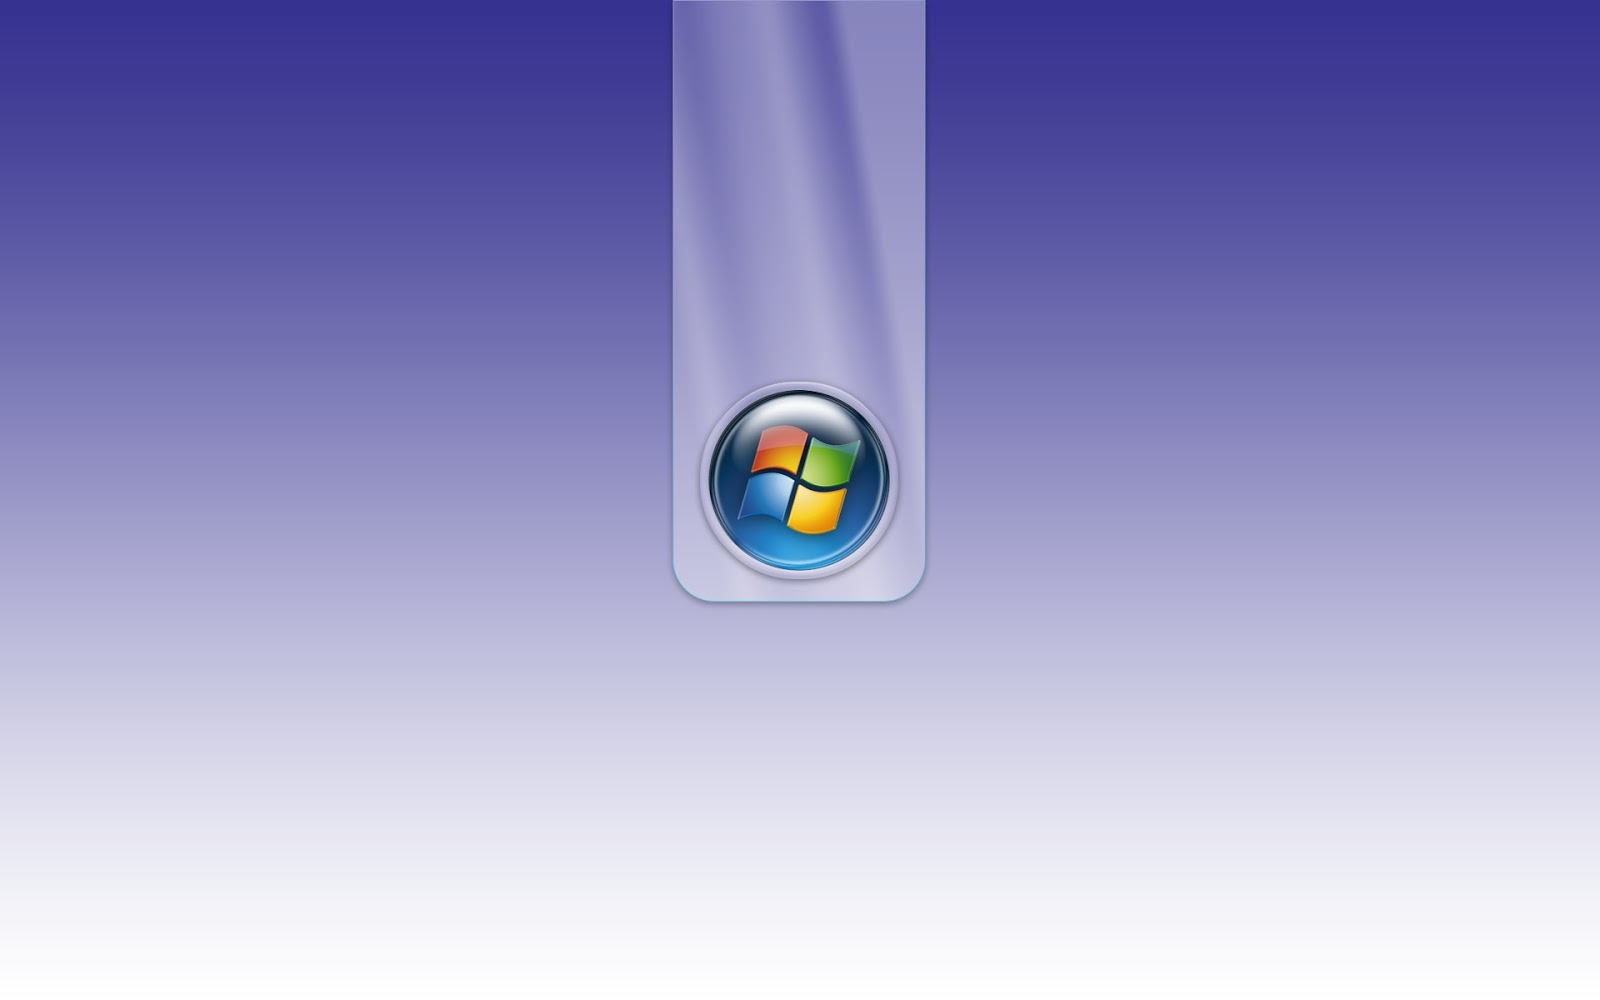 windows 8 wallpapers download hd - download mars sebumi